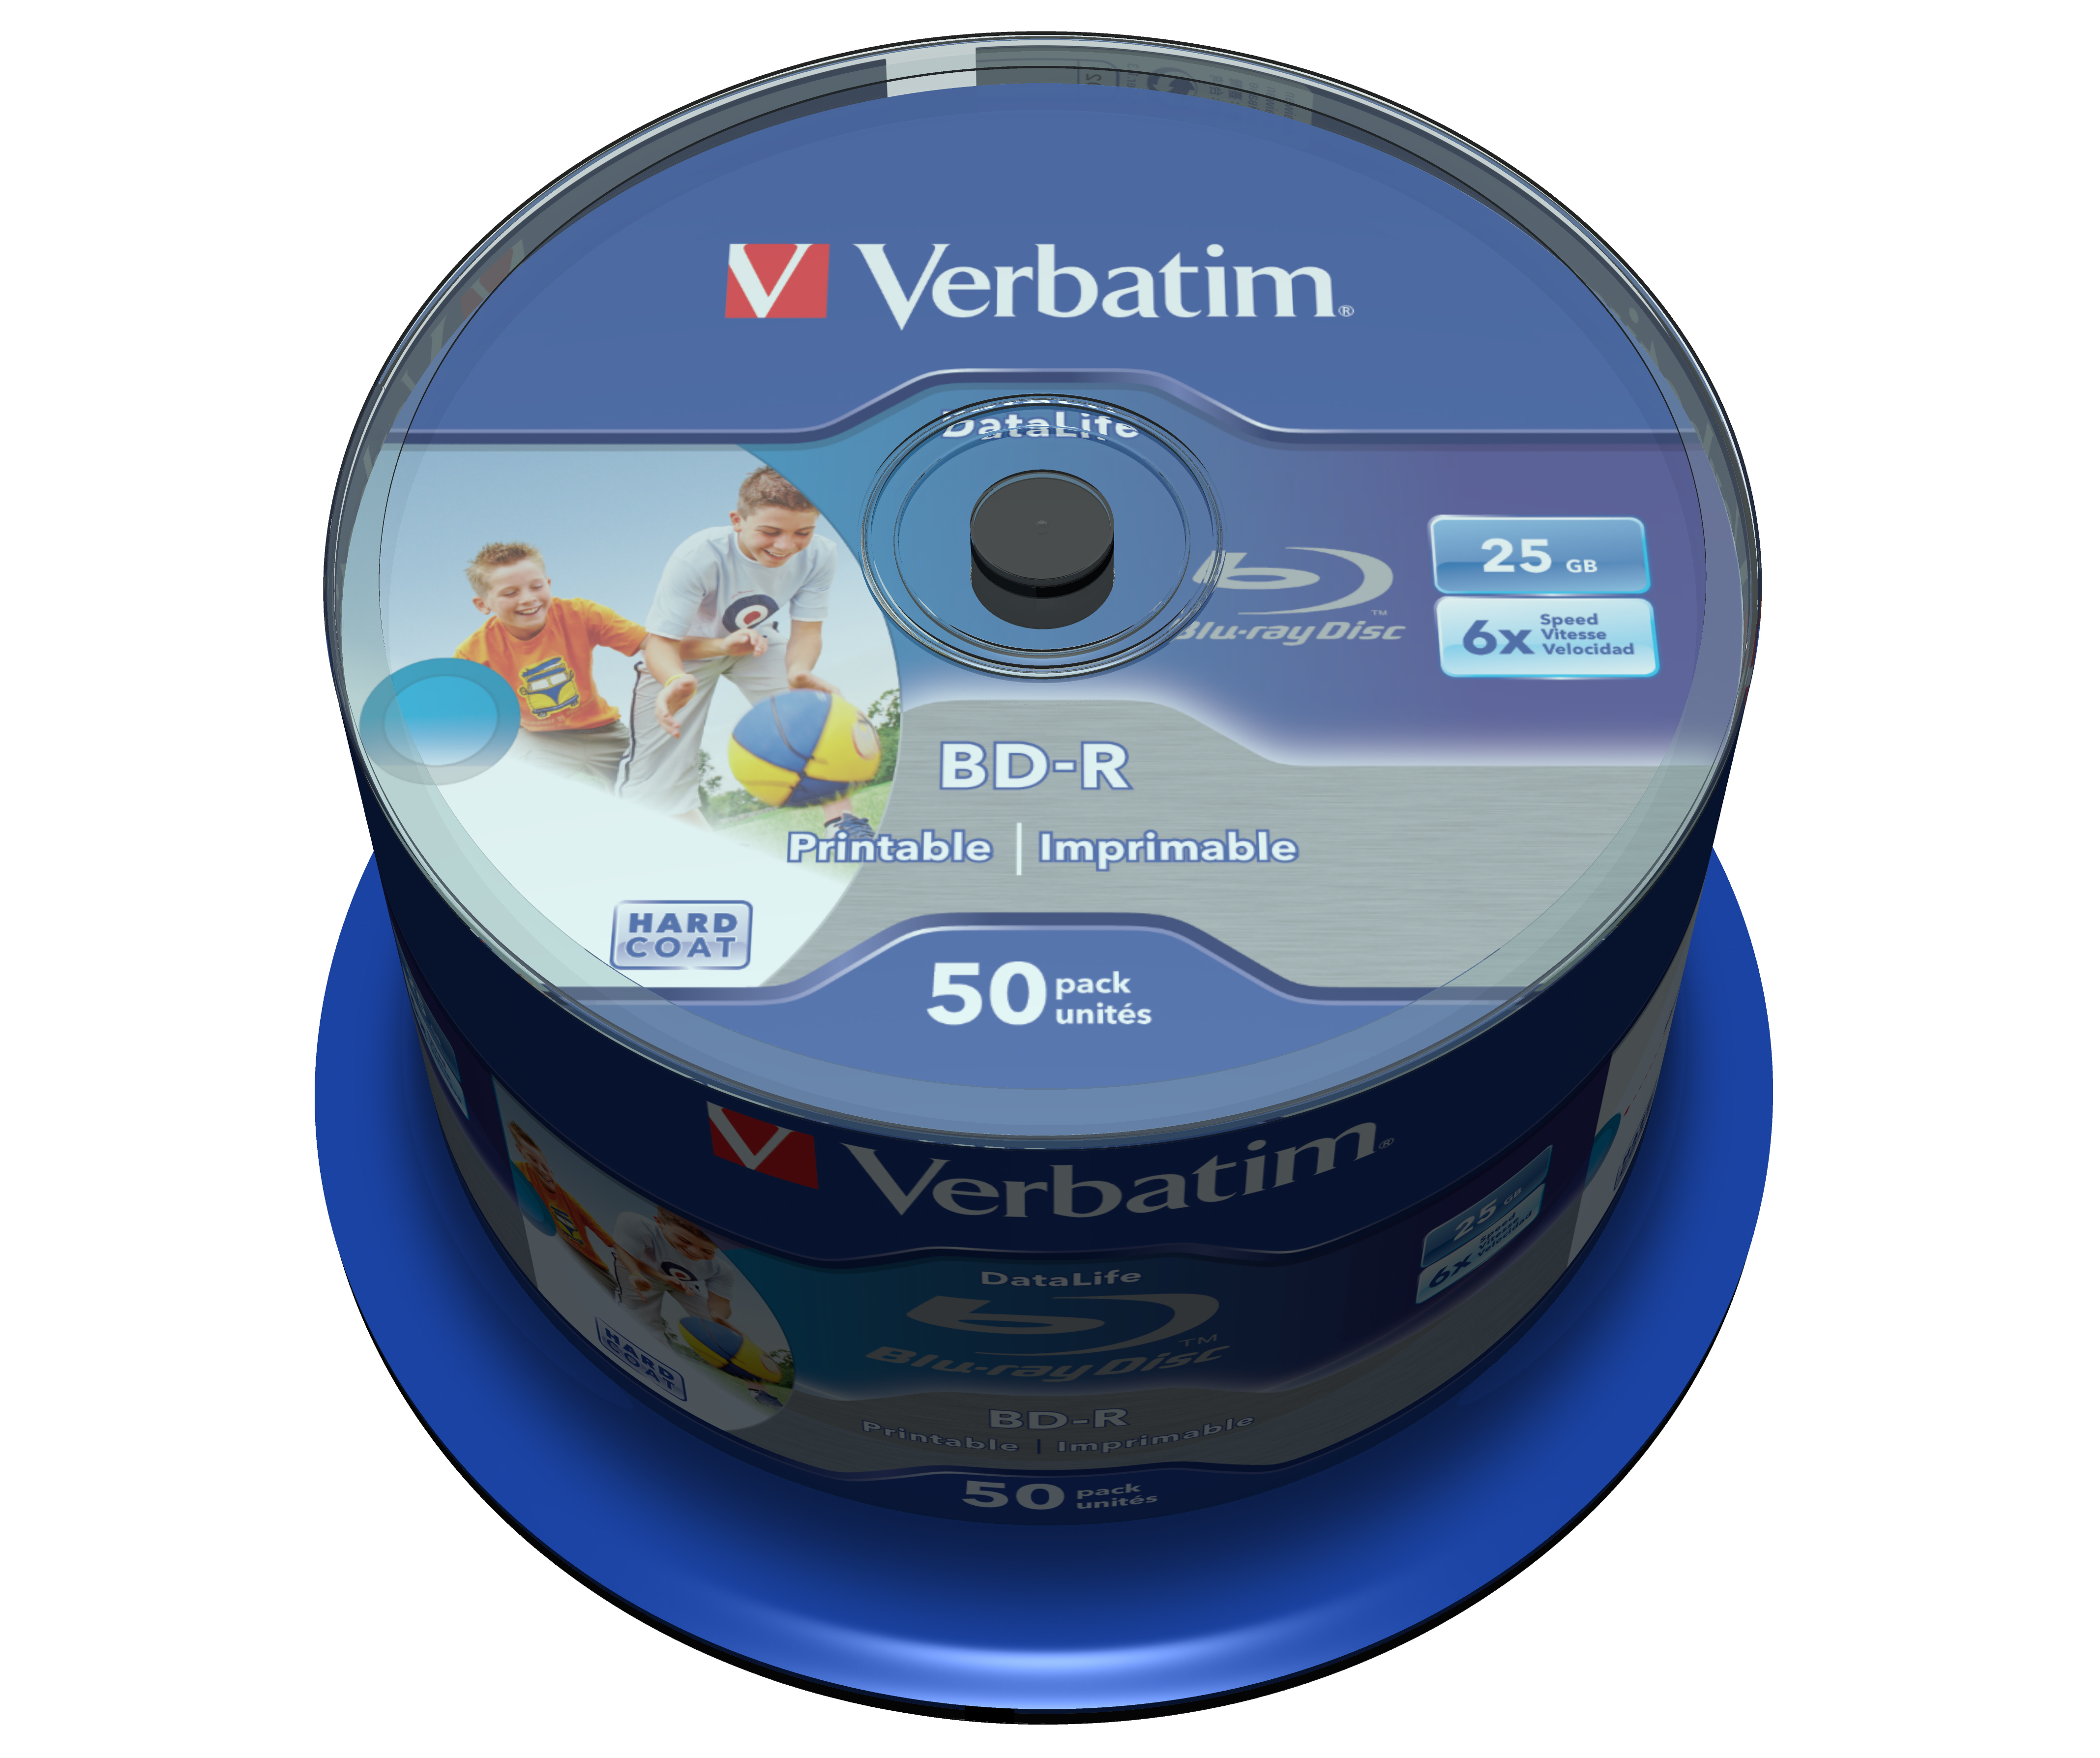 DataLife BD-R 25 GB, 6 speed (inkjet printable, 50-pack spindel)